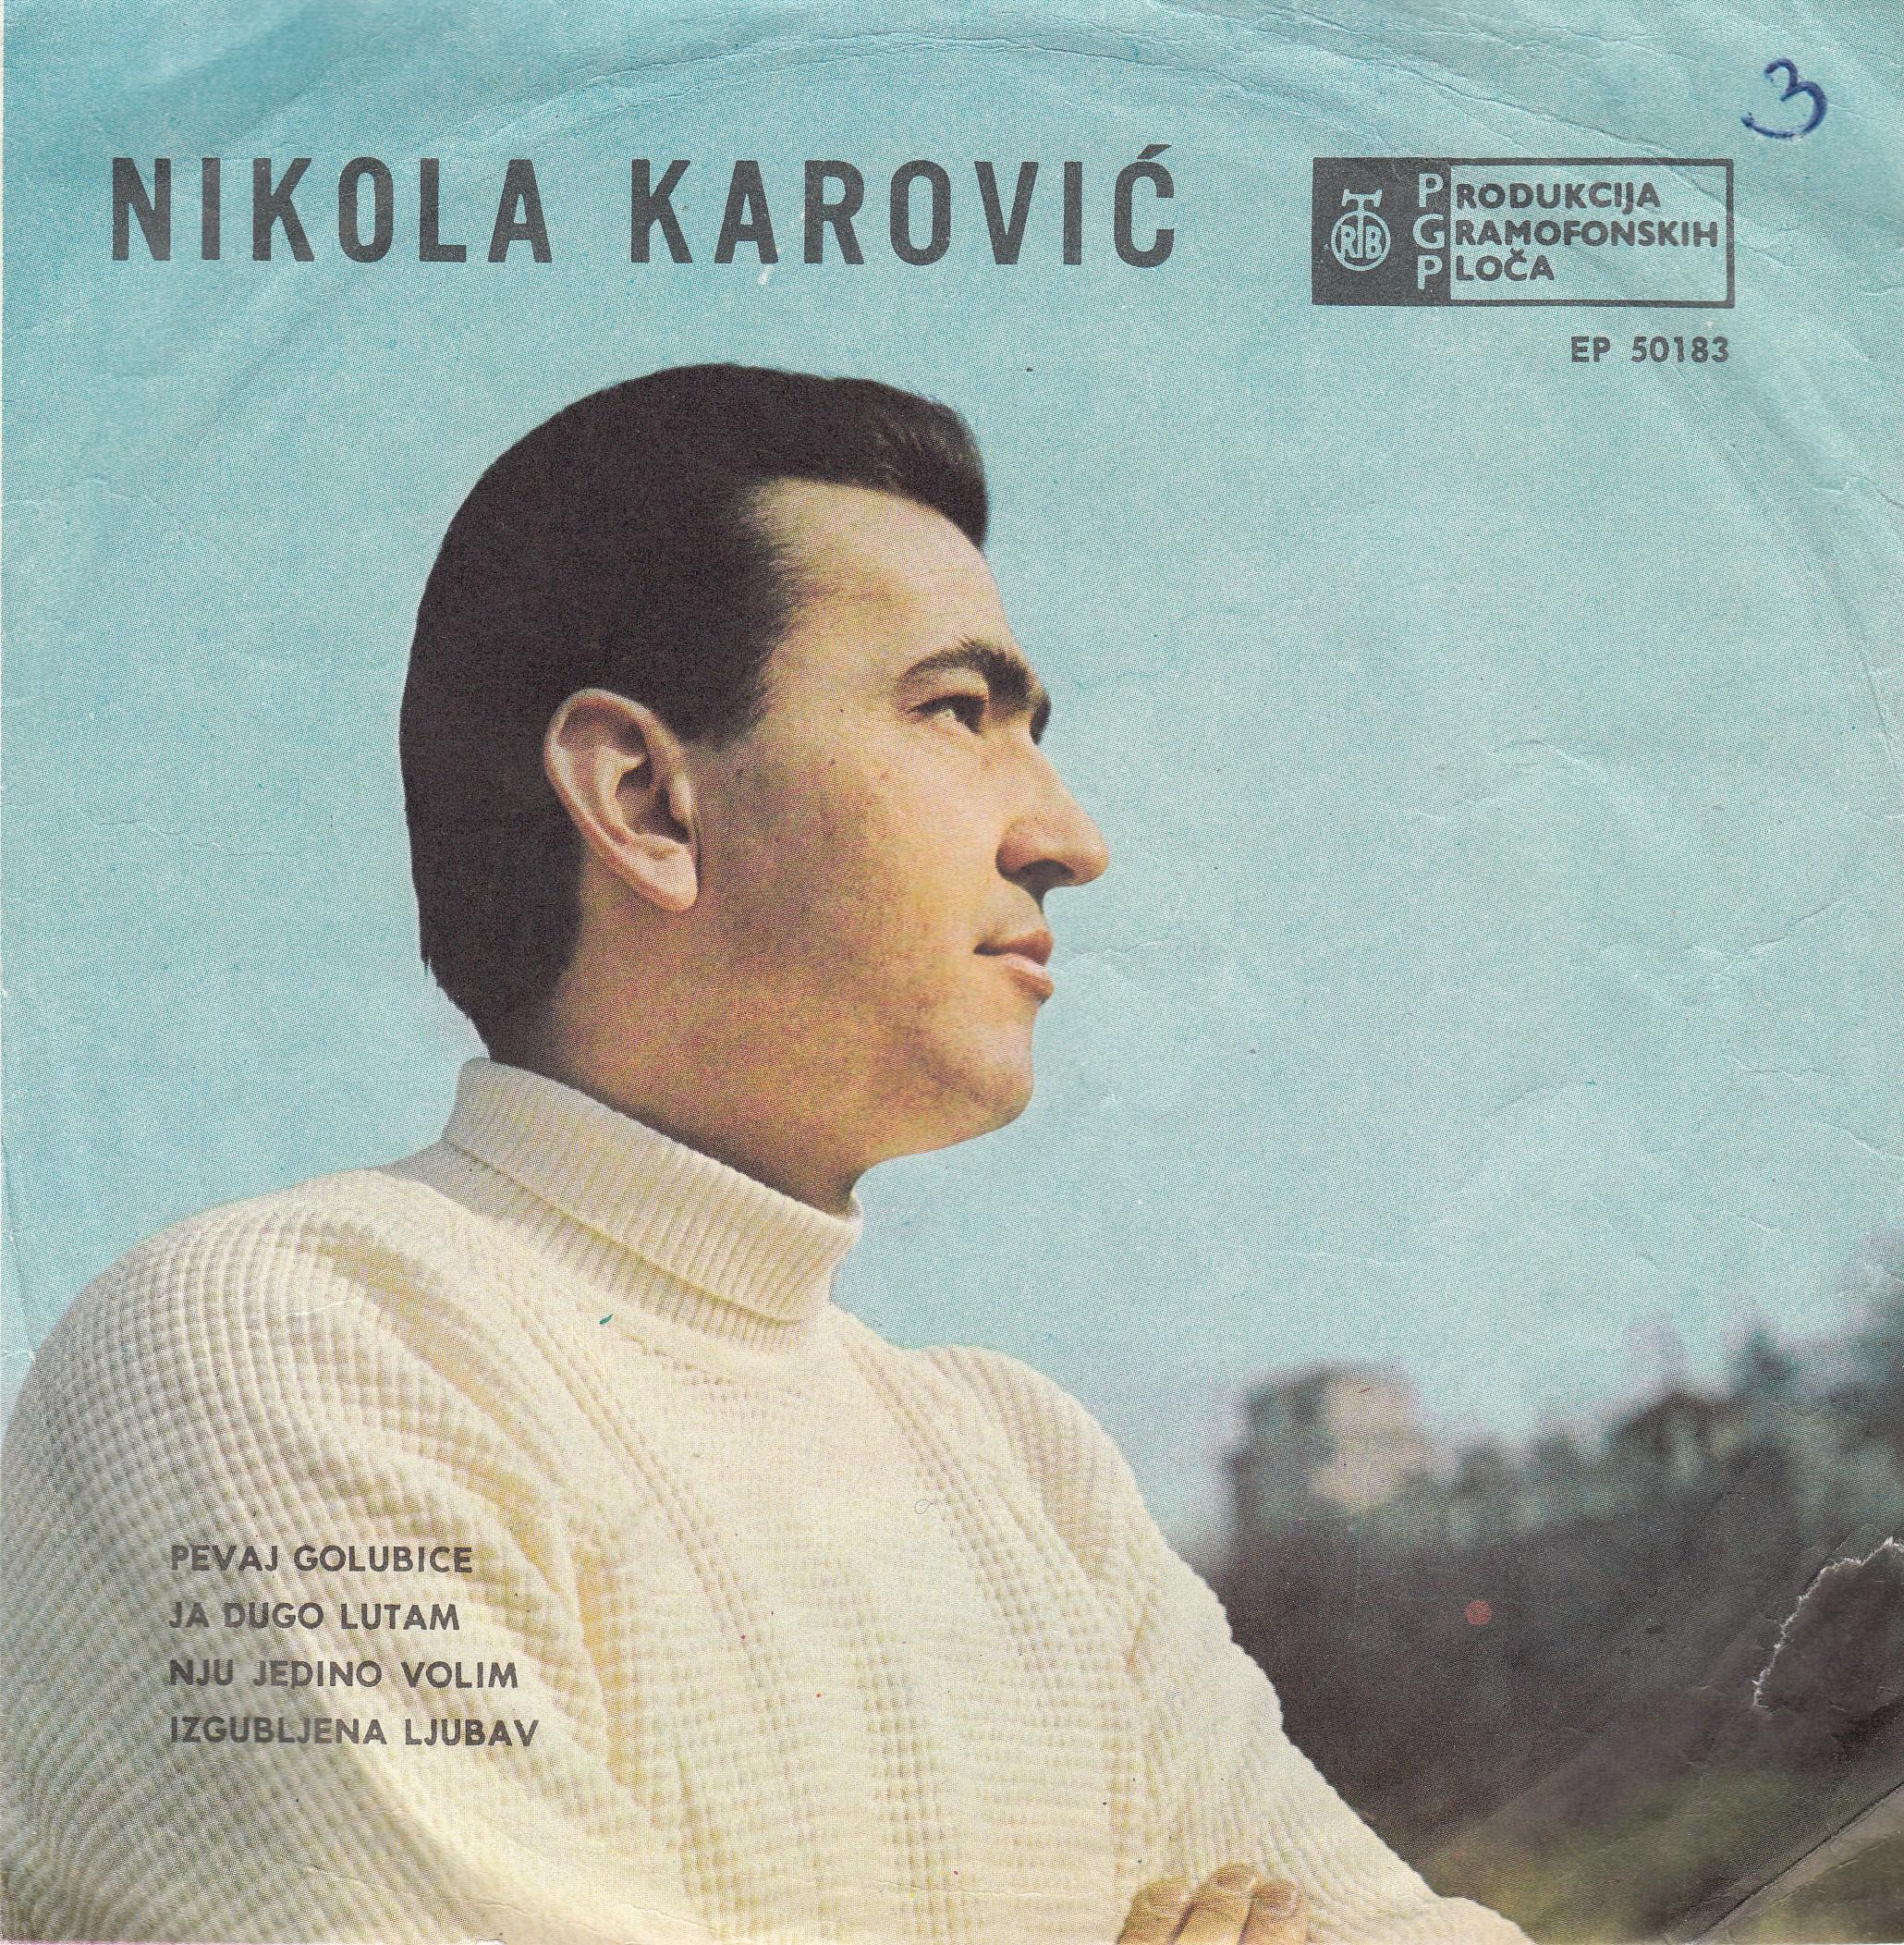 Karovic Nikola - Pevaj Golubice/ja Dugo Lutam/nju Jedino Volim/izgubljena Ljubav